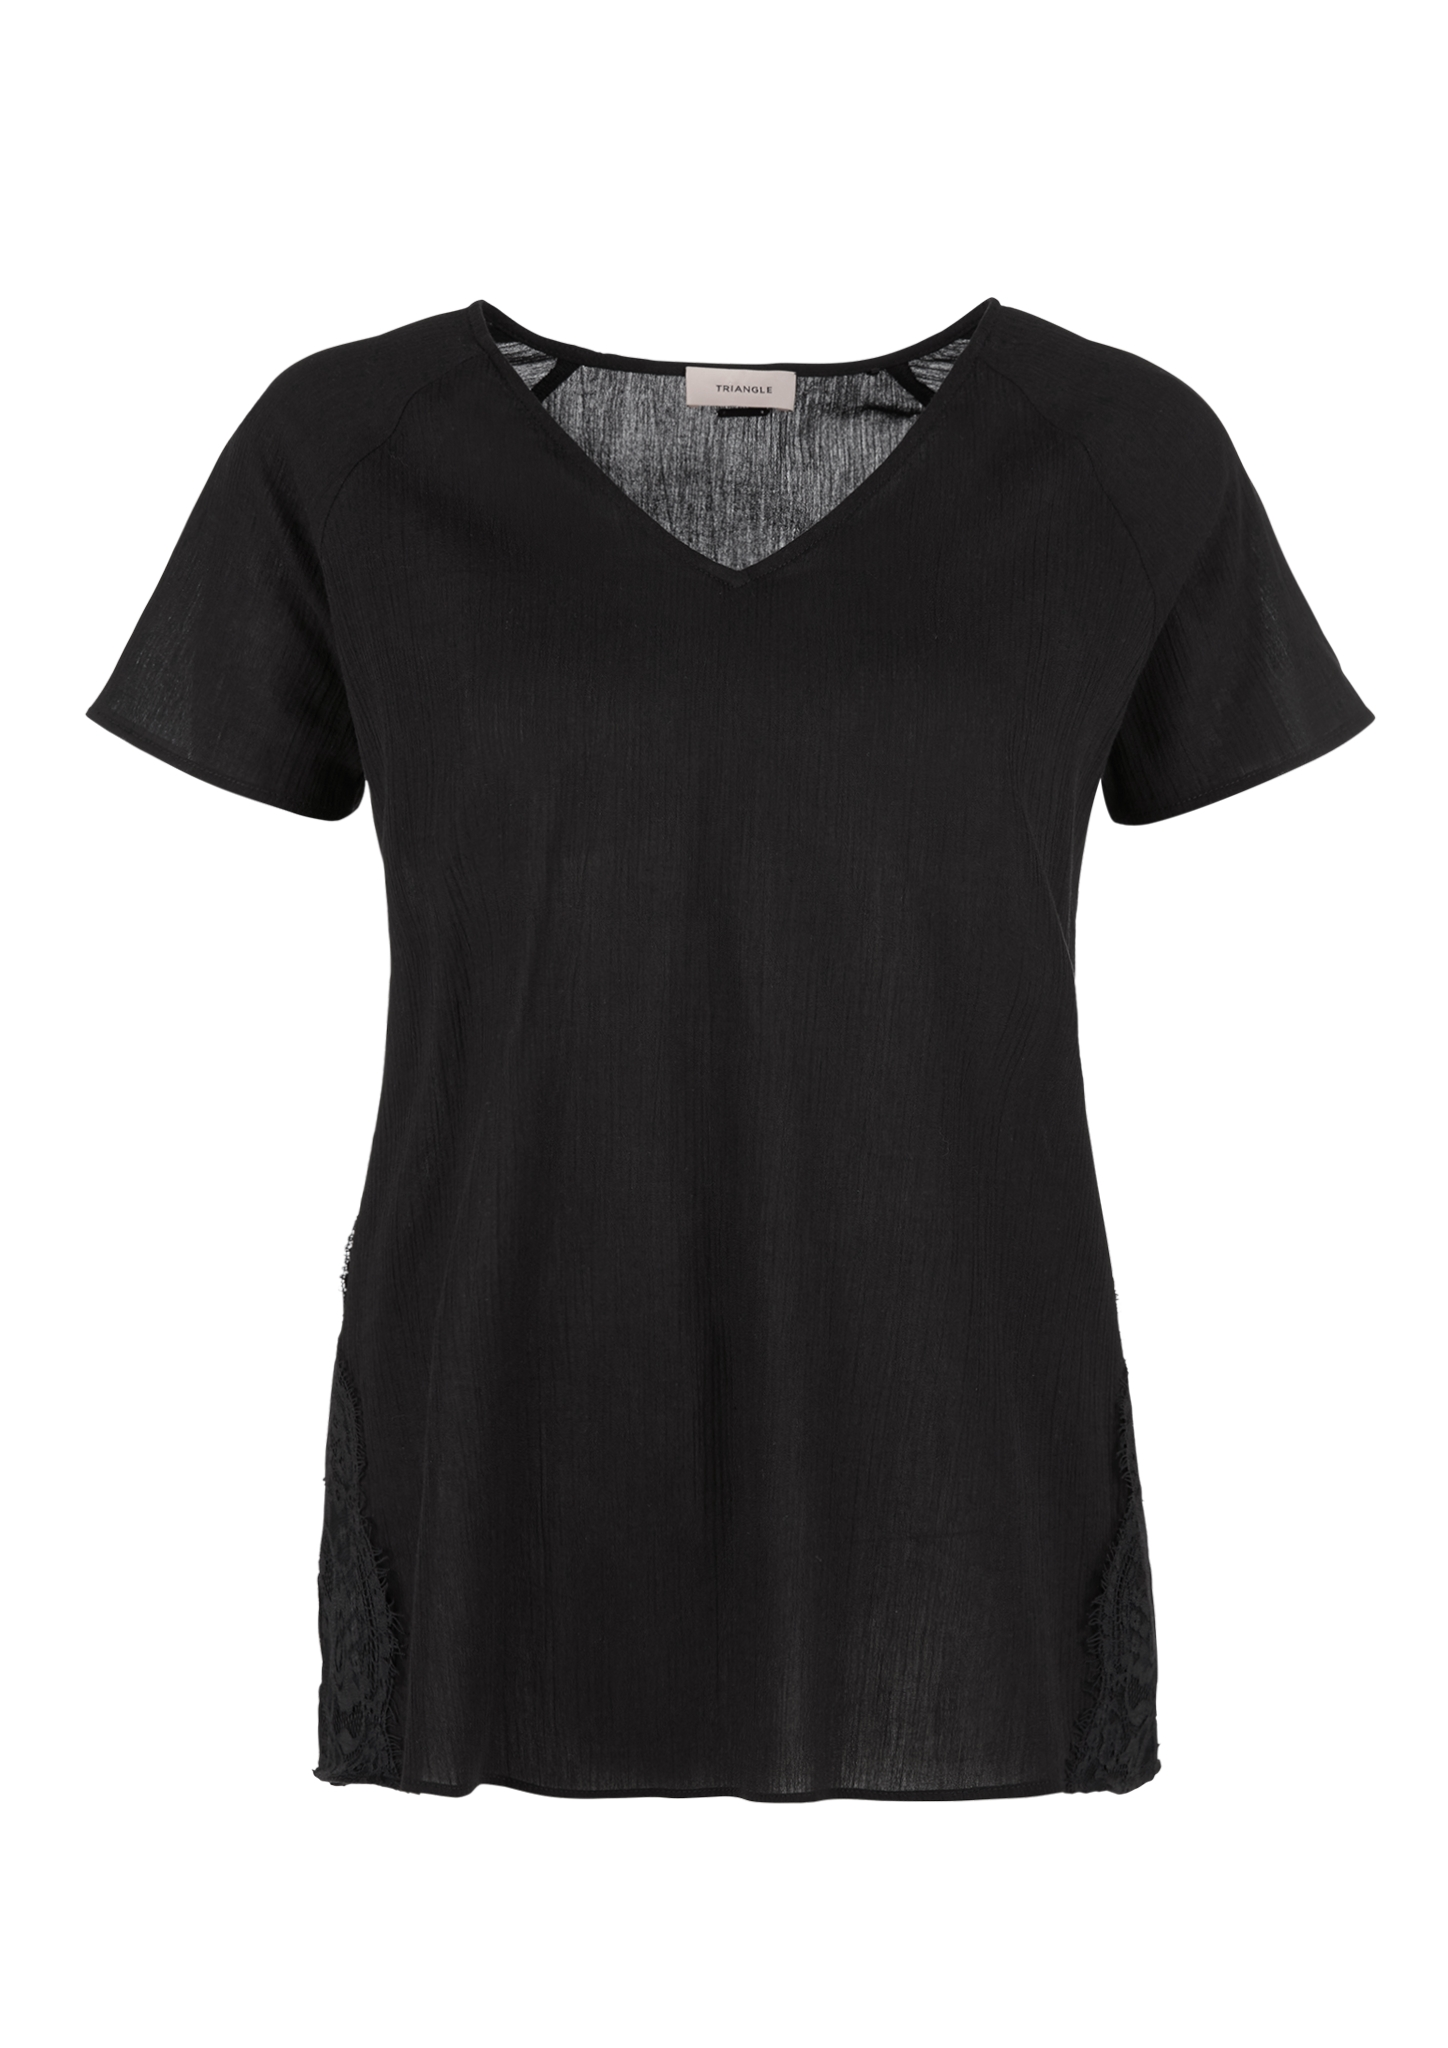 Crinkle-Bluse | Bekleidung > Blusen > Crinkleblusen | TRIANGLE